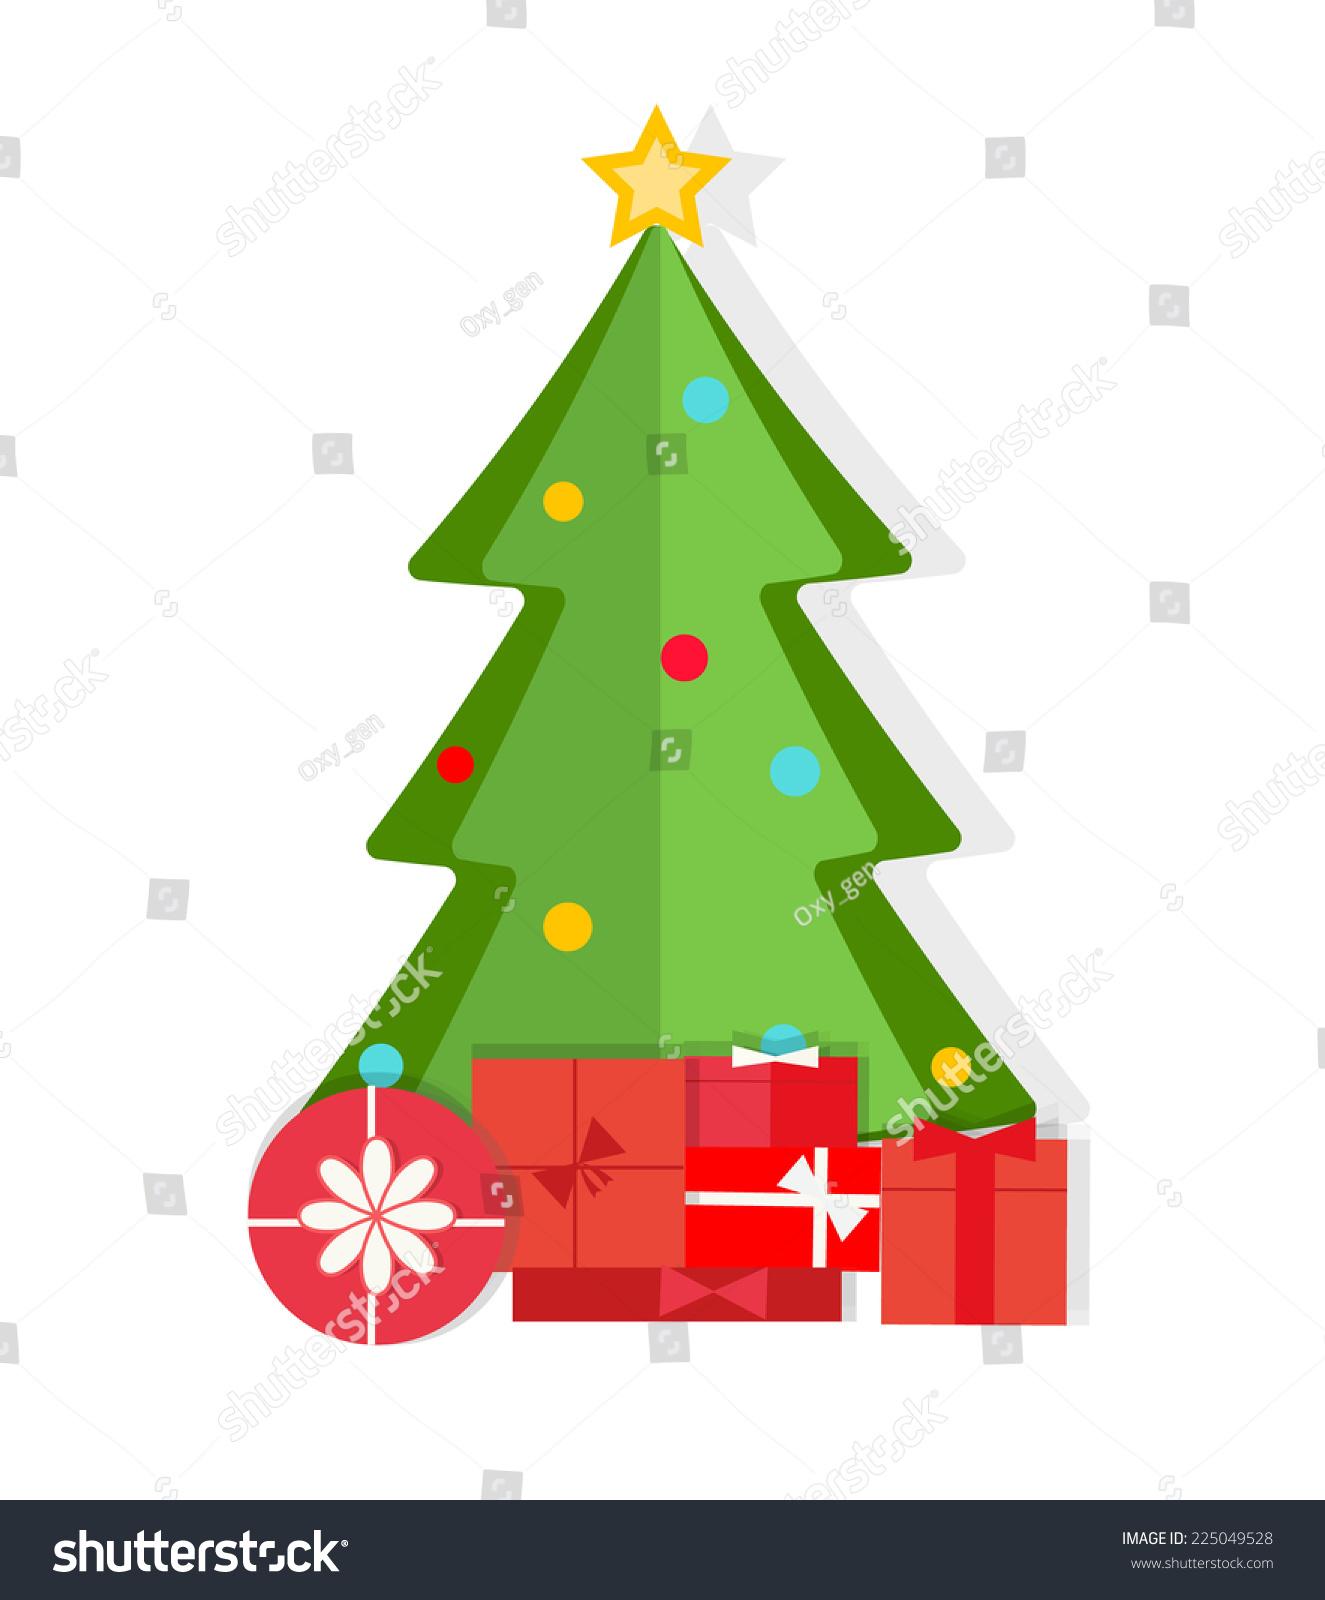 christmas tree gifts flat design style stock vector 225049528 stock vector christmas tree and gifts in - Flat Christmas Tree